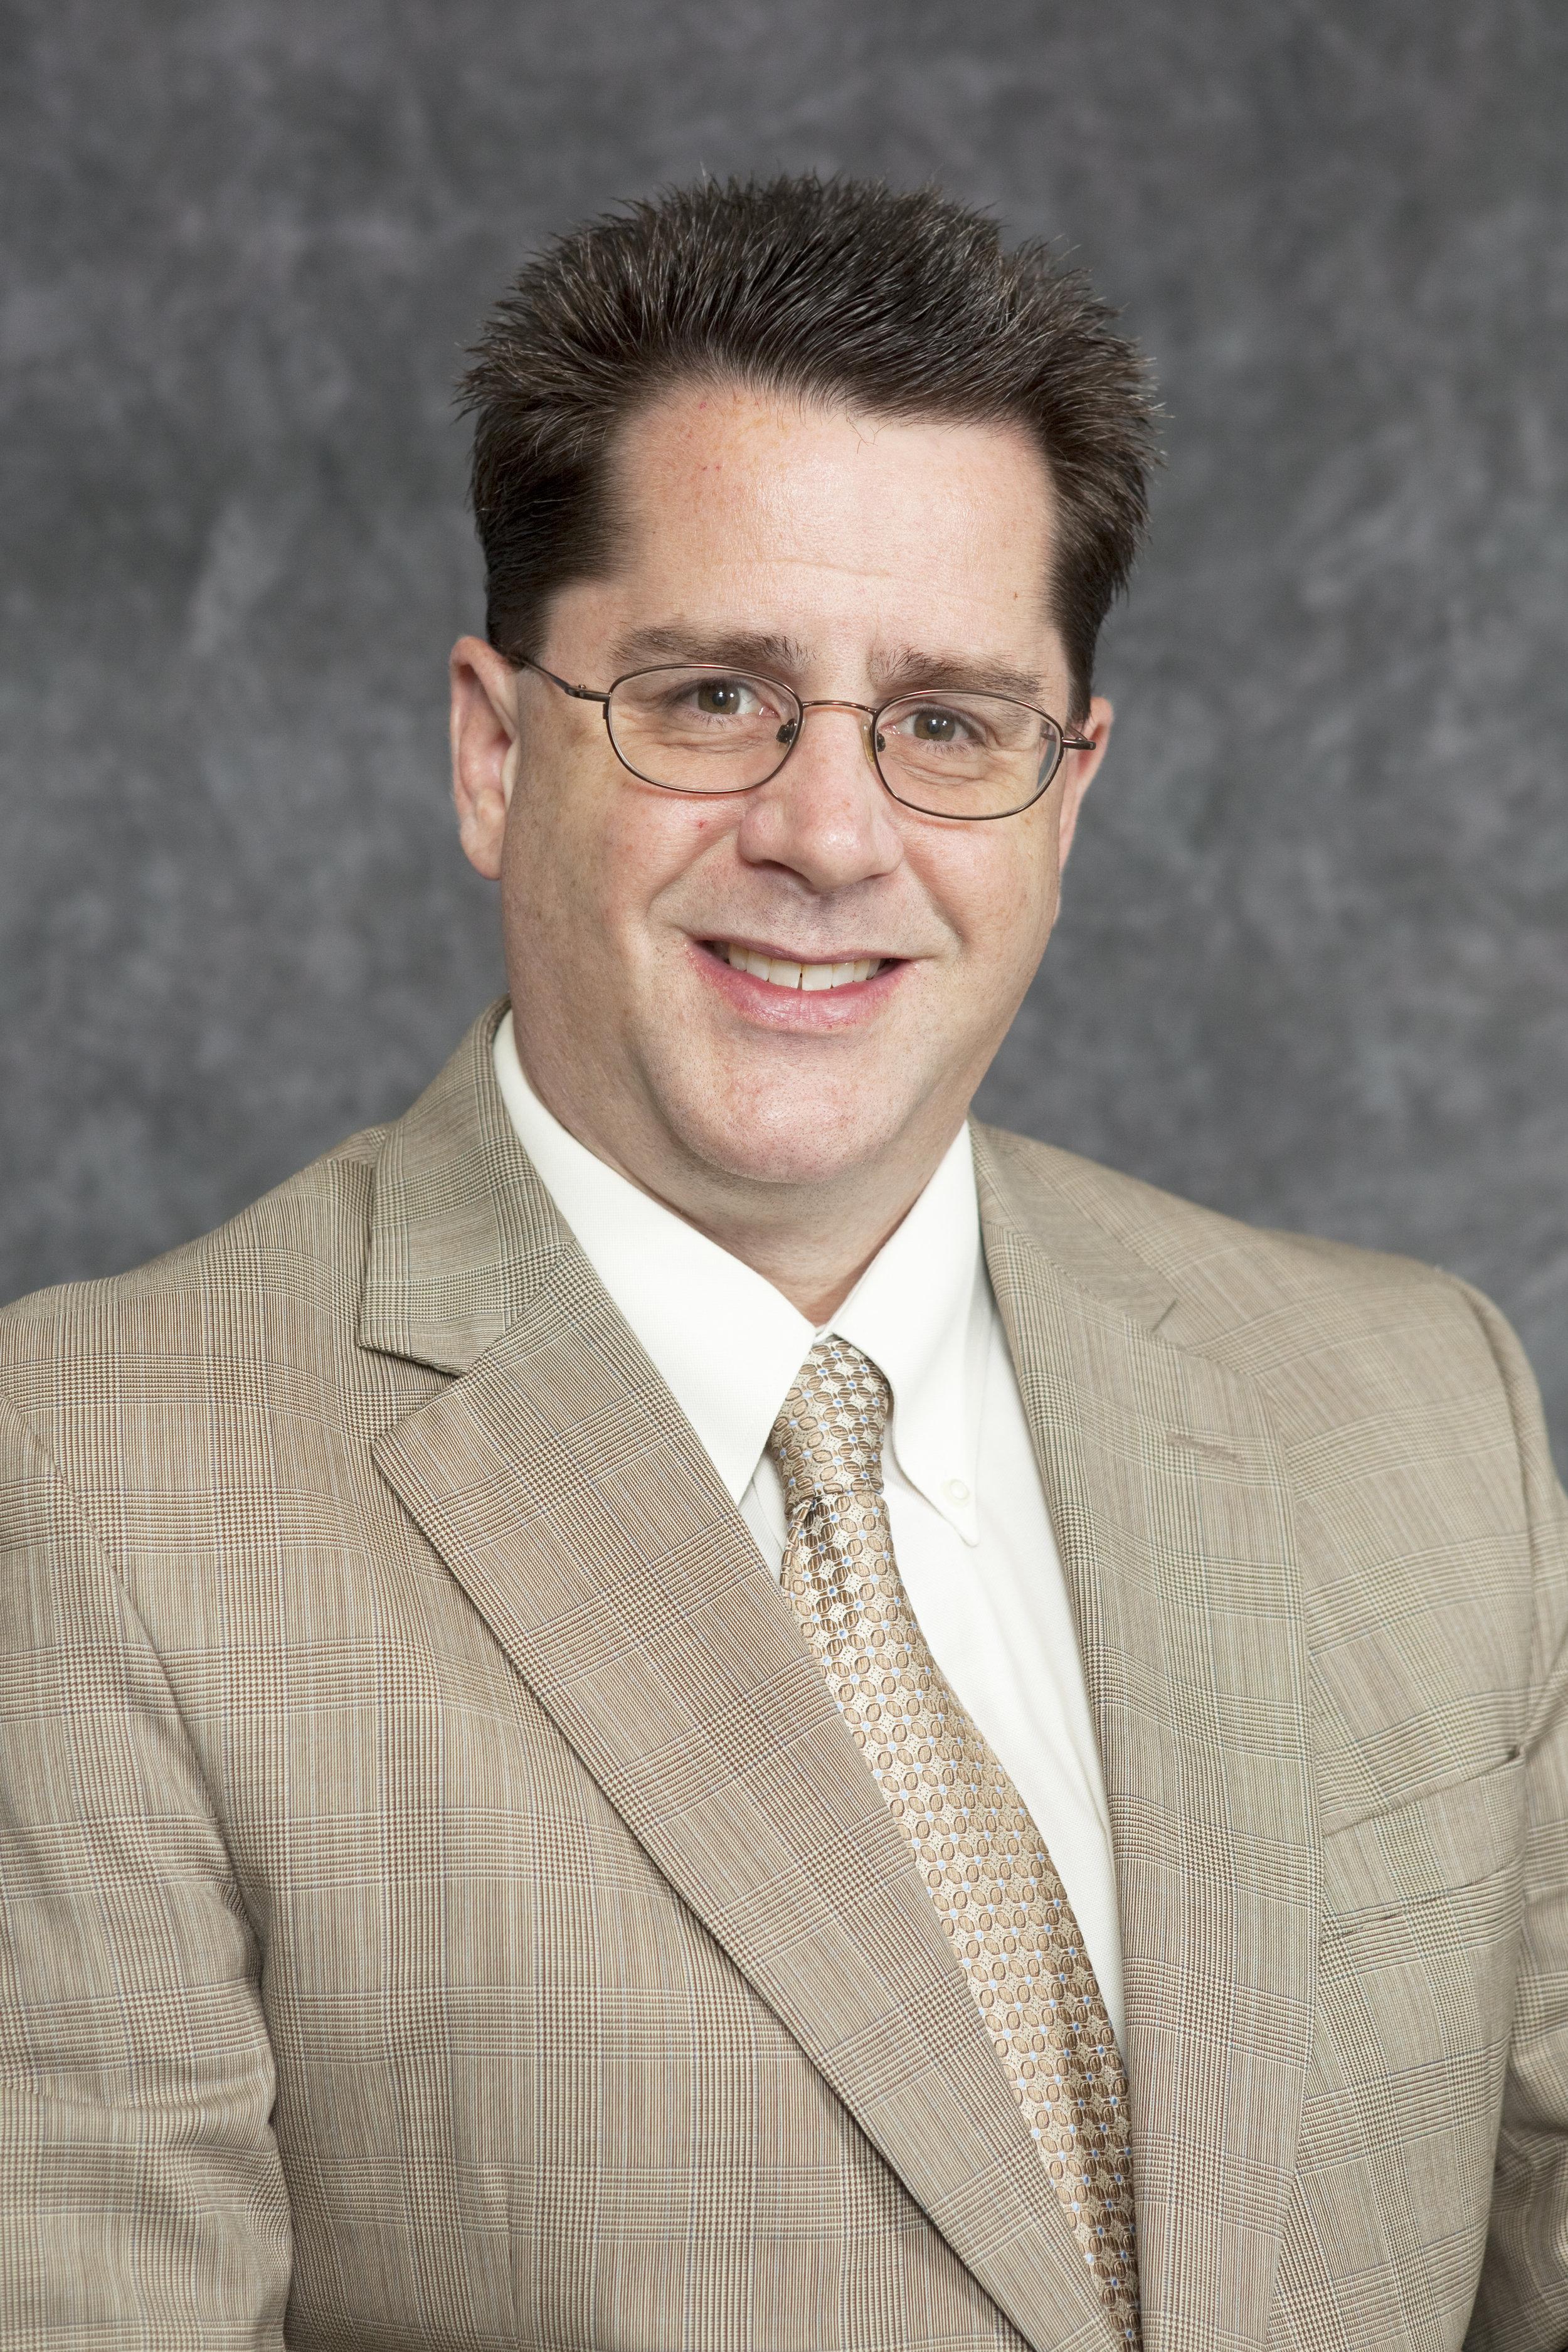 Steve Sandvoss Executive Director (217) 782-4141  ssandvoss@elections.il.gov   Website